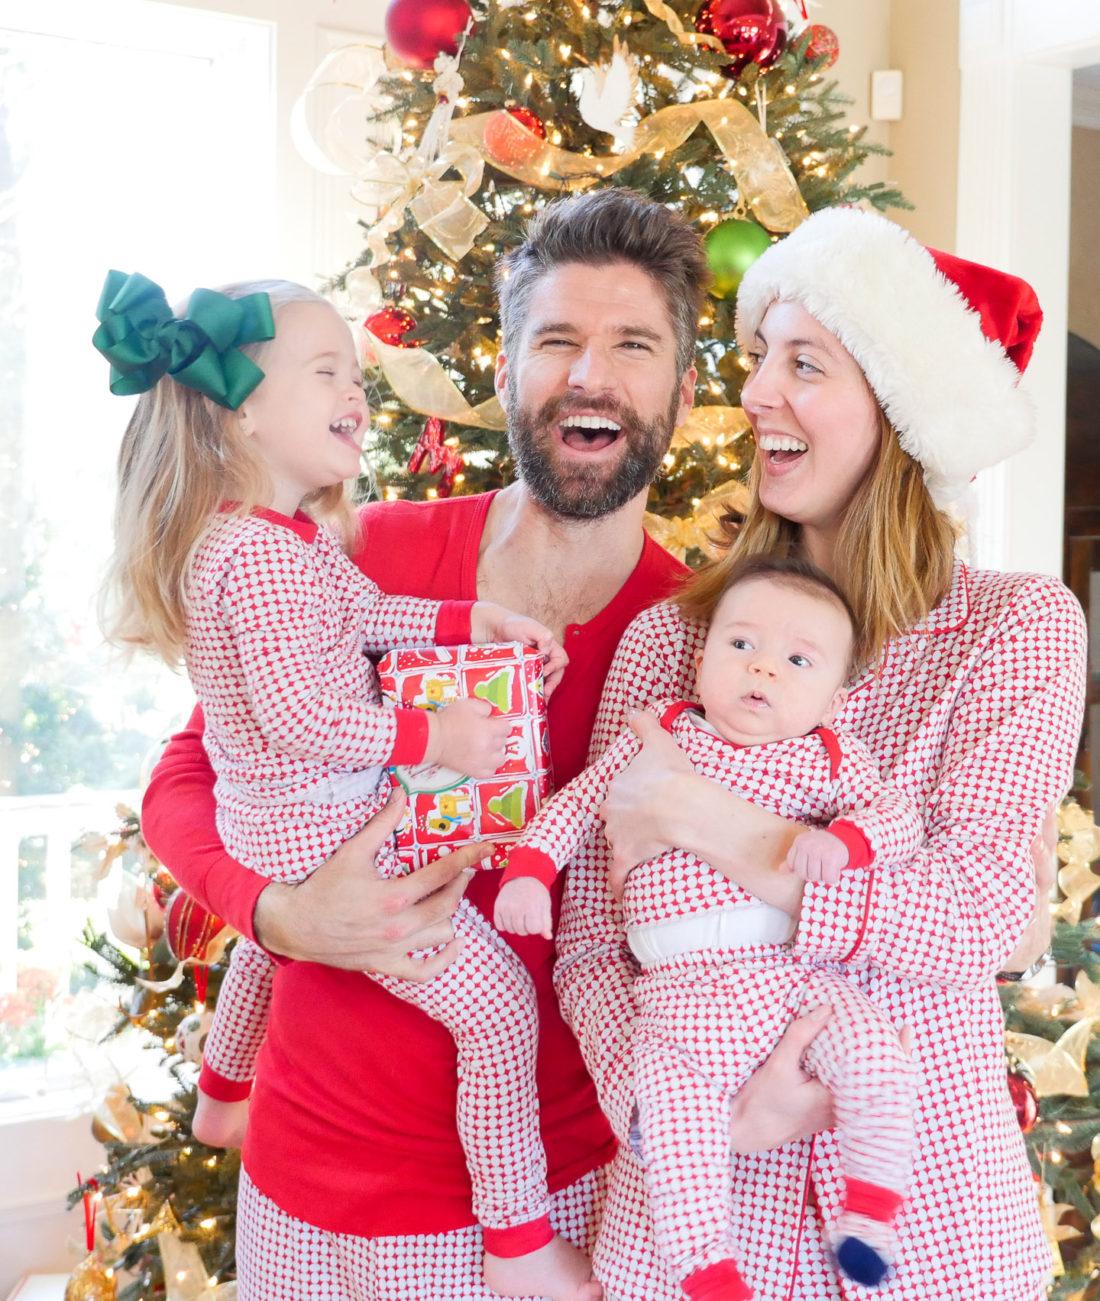 Eva Amurri Martino and her family celebrate the Christmas Holiday in matching pajamas